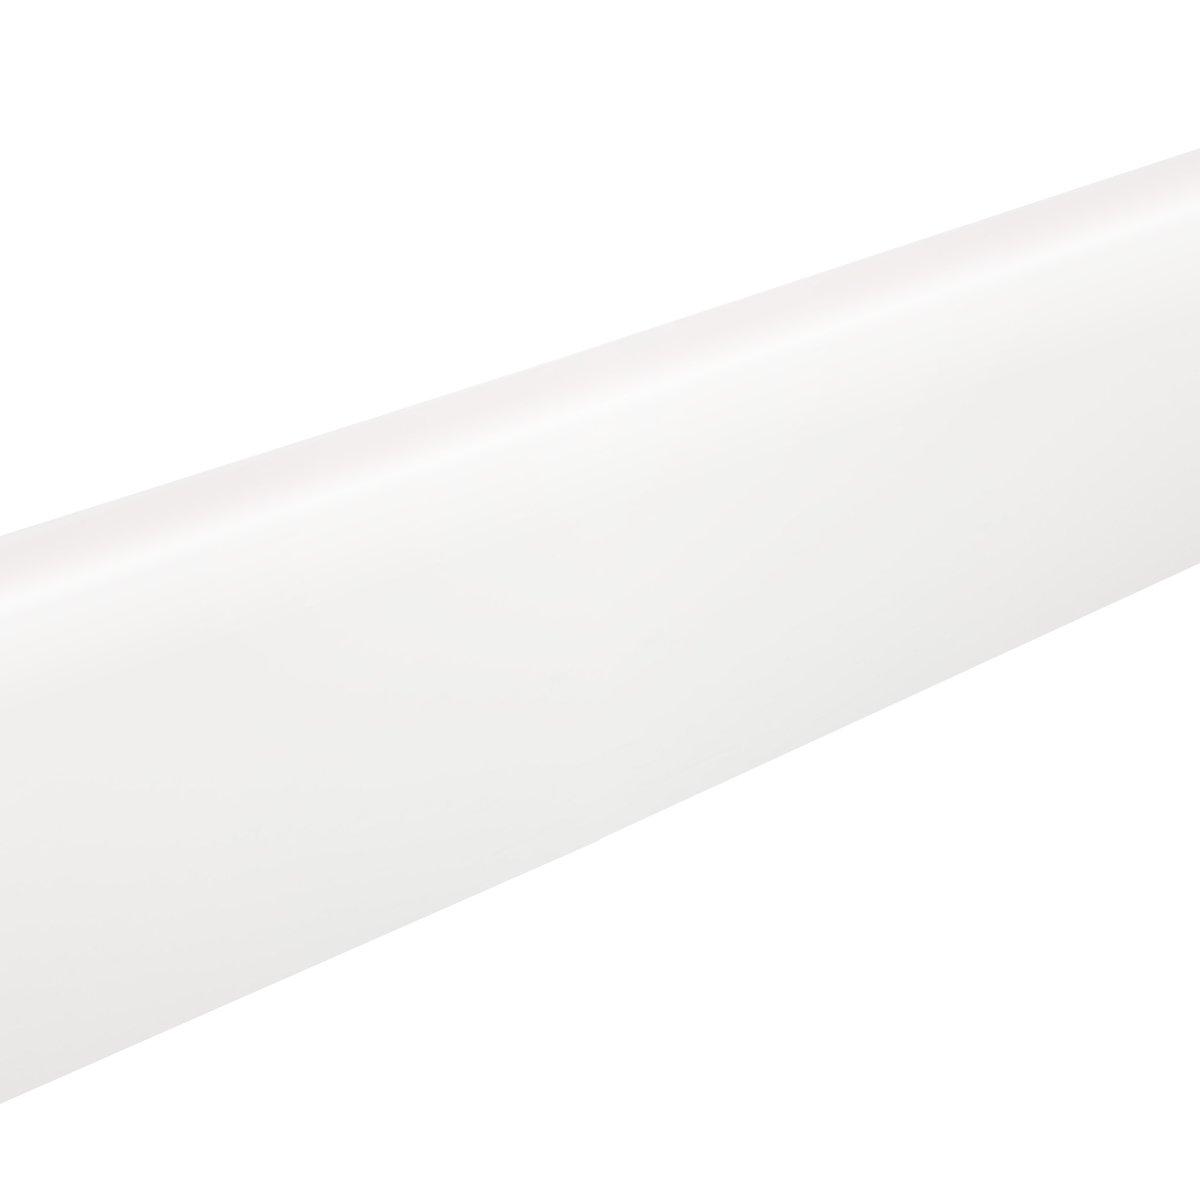 Umleimer 1.32 /× 40mm /× 0.6mm WORKTOPEXPRESS Wei/ße Resopal K/üchenarbeitsplatten